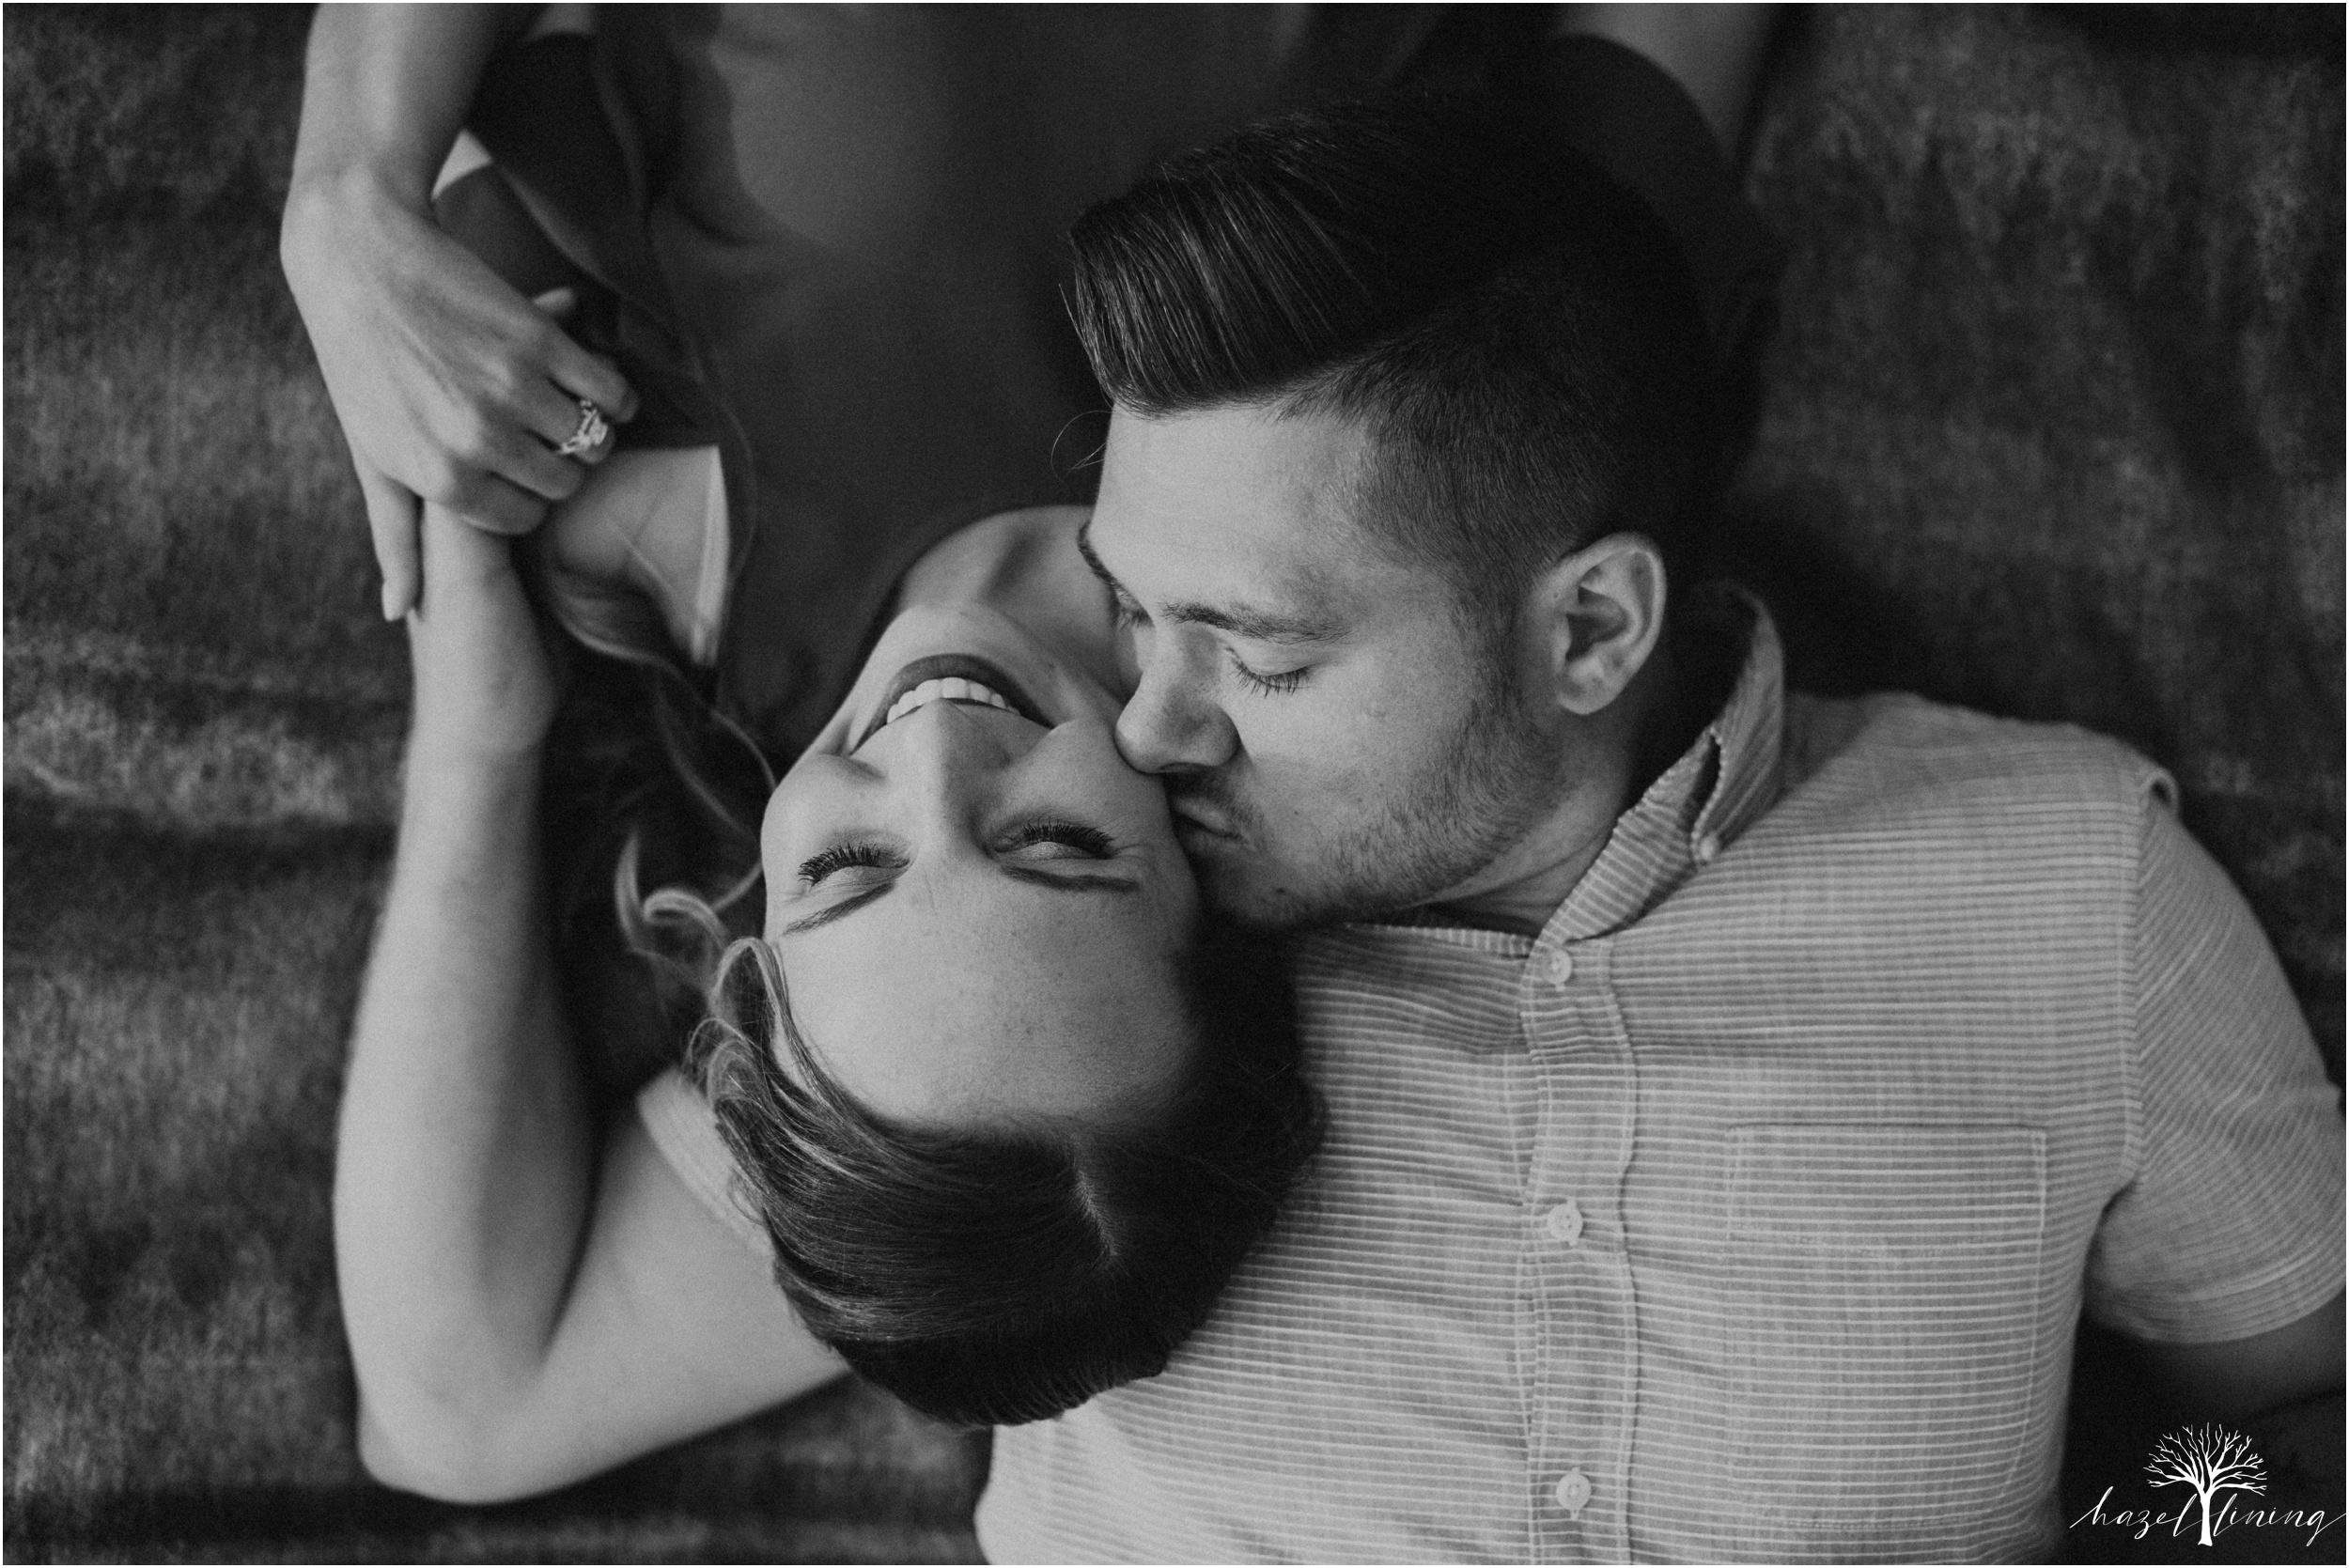 rachel-warner-chris-niedrist-the-farm-bakery-and-events-quakertown-pa-summer-engagement-hazel-lining-photography-destination-elopement-wedding-engagement-photography_0078.jpg